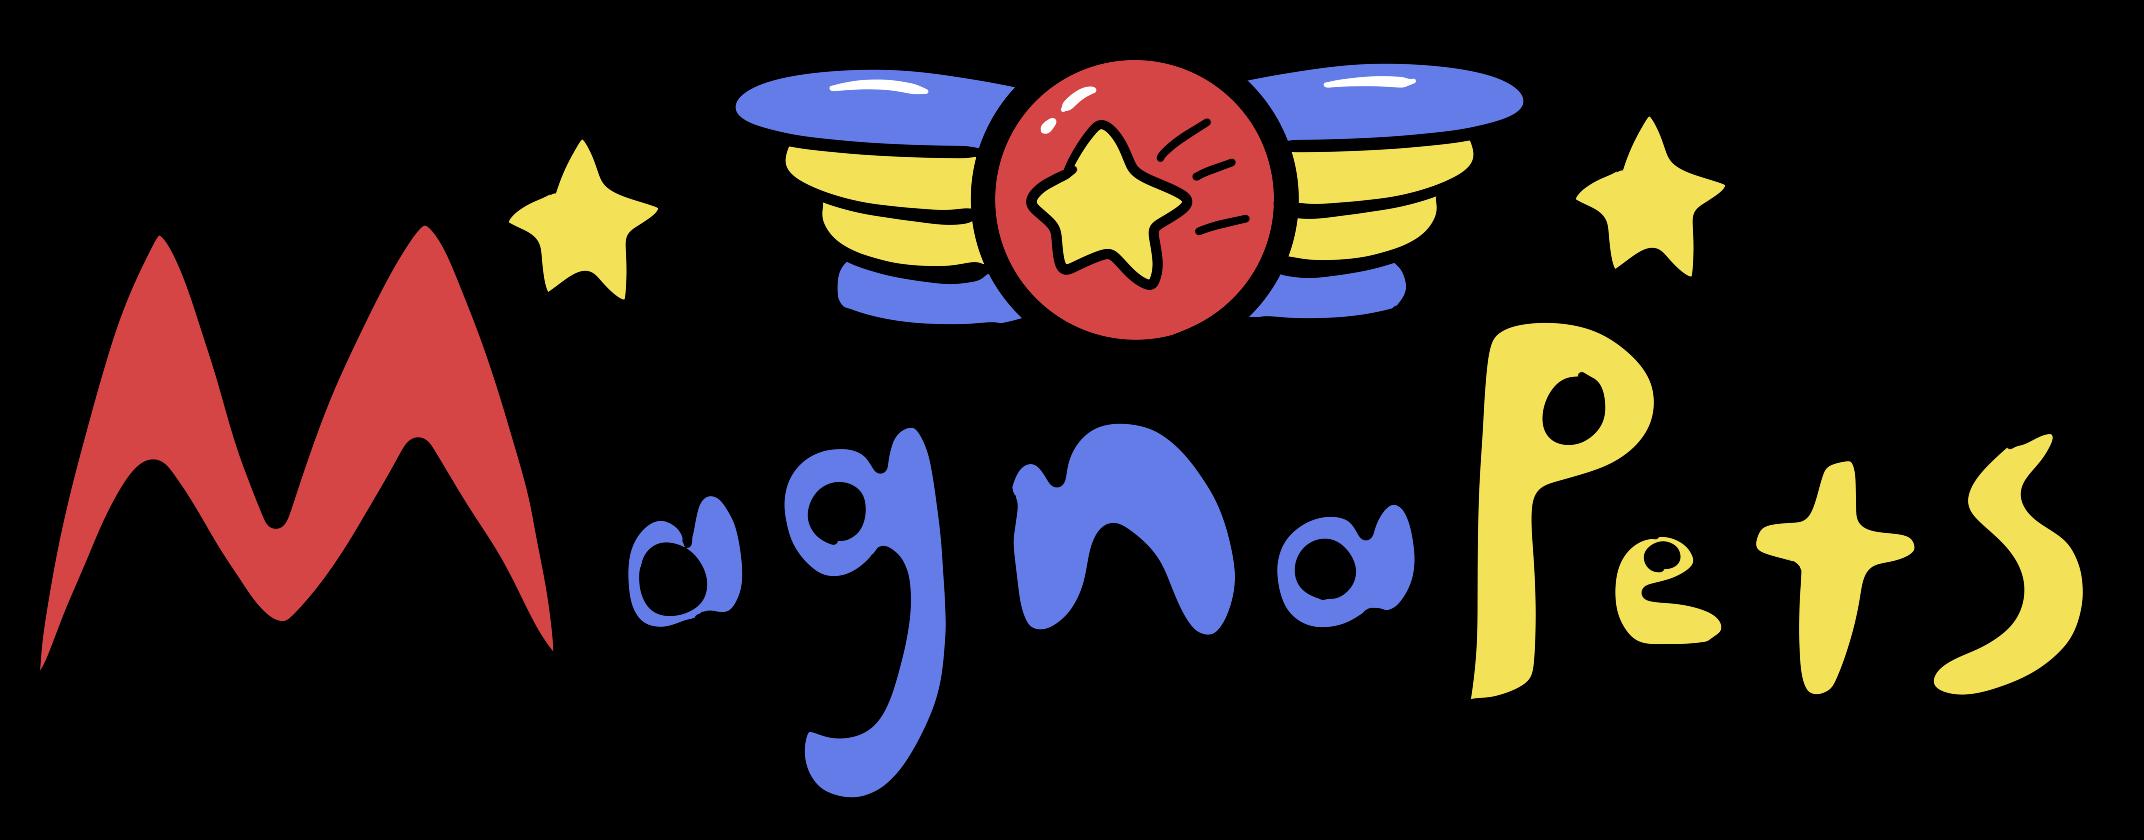 Magnapets